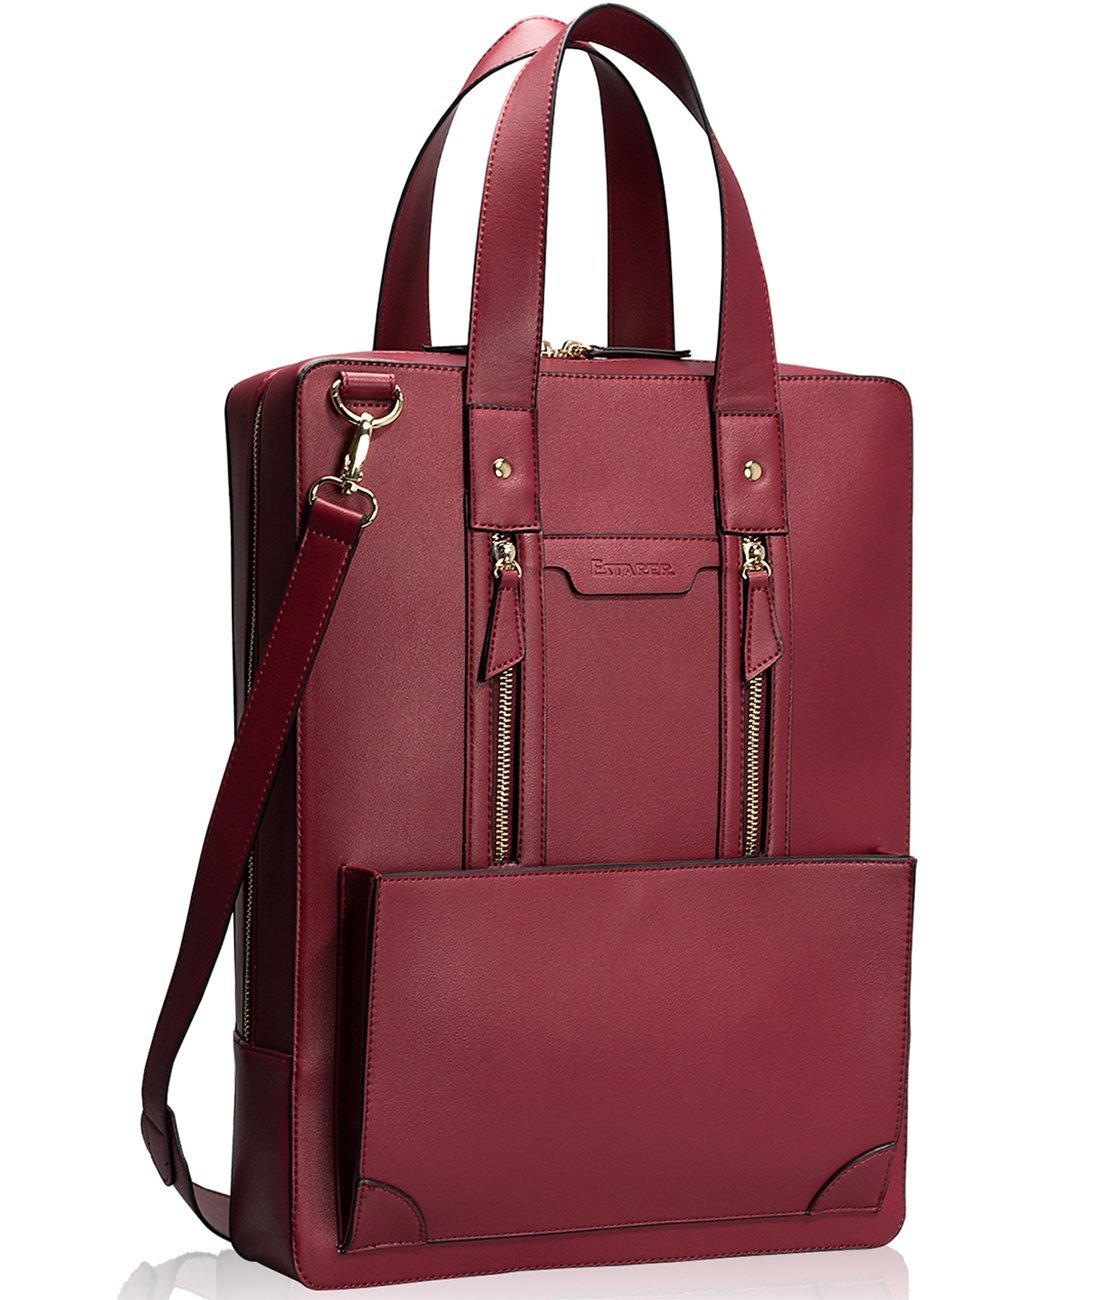 22d176da1523 Cheap Briefcase Bag Women, find Briefcase Bag Women deals on line at ...